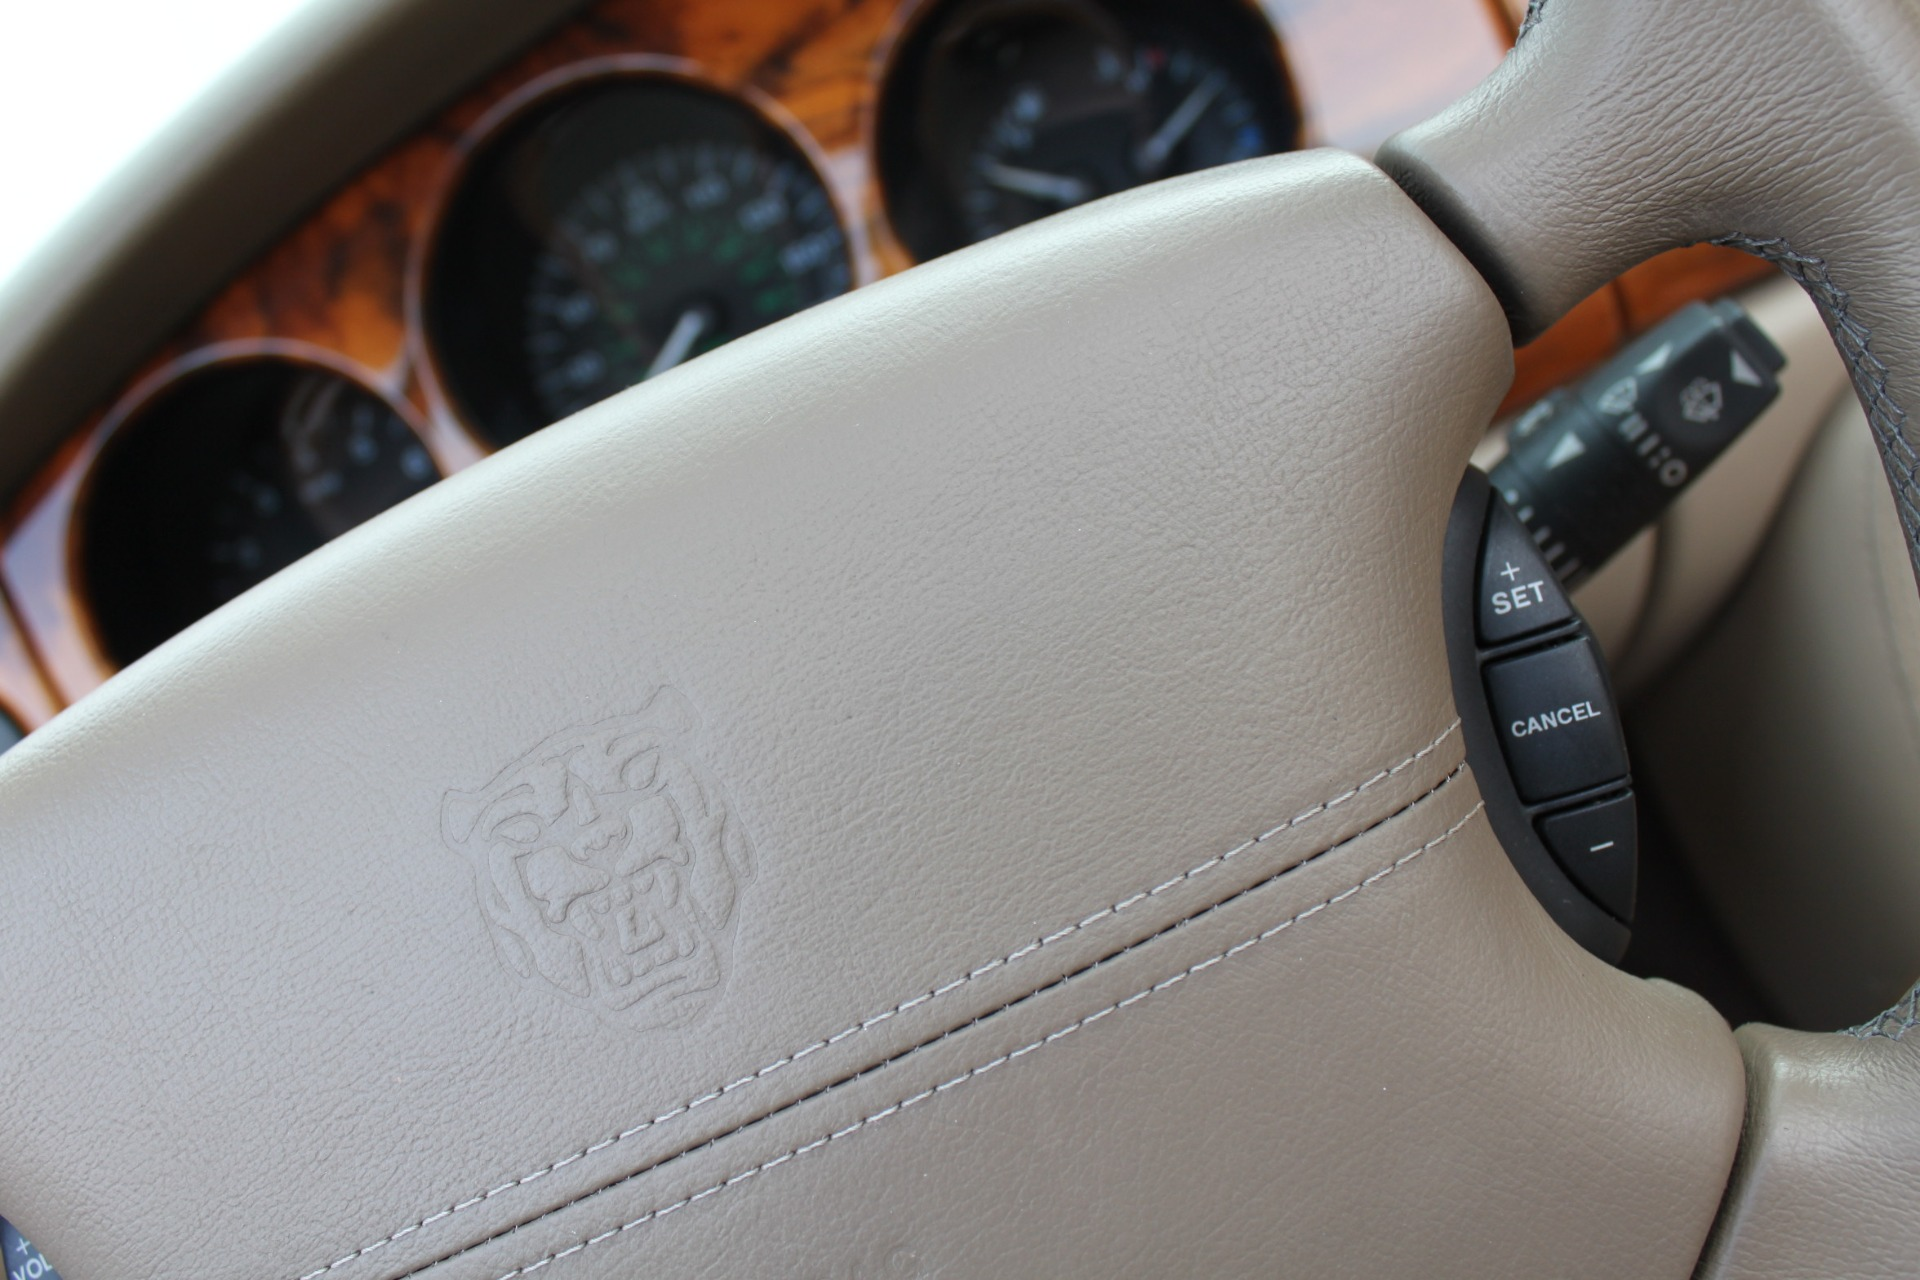 Used-2002-Jaguar-XK8-Convertible-XK8-Jeep